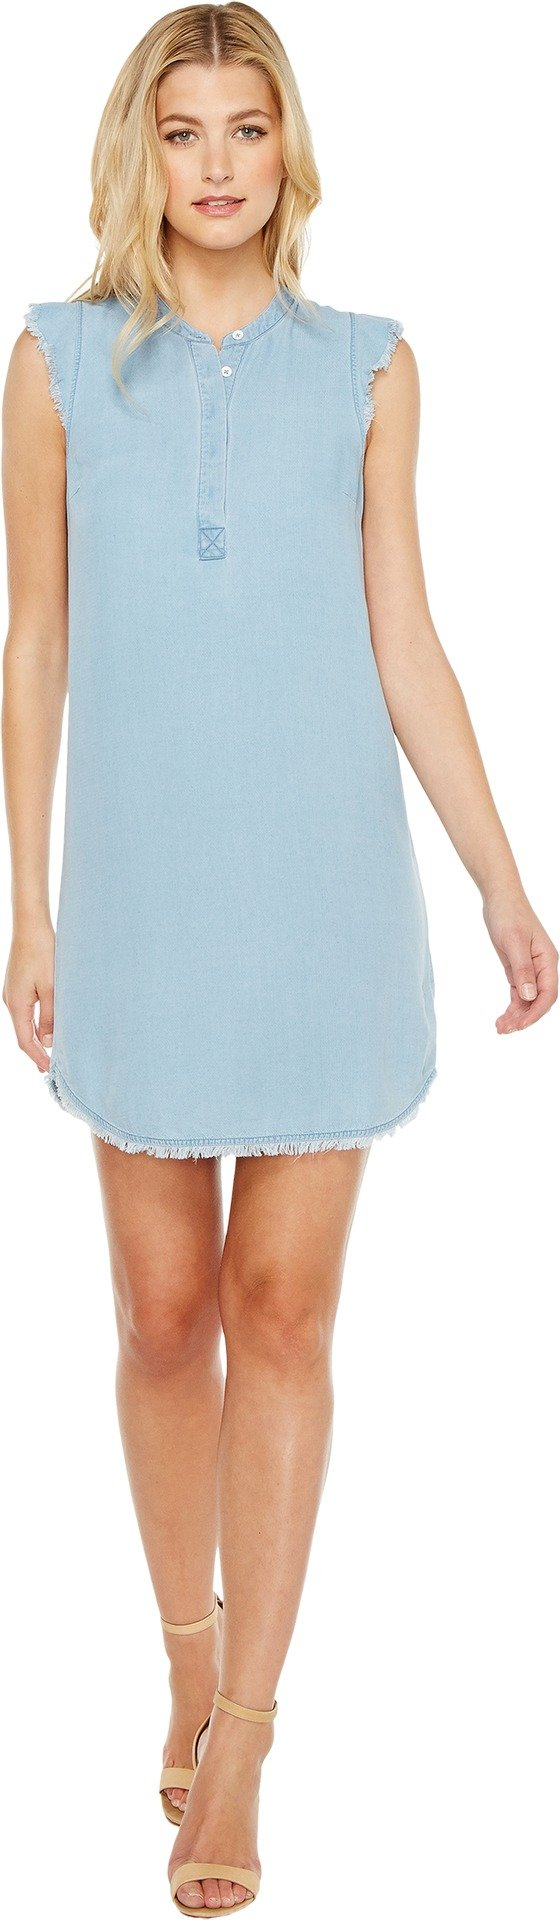 Splendid Women's Henley Dress Light Wash Dress